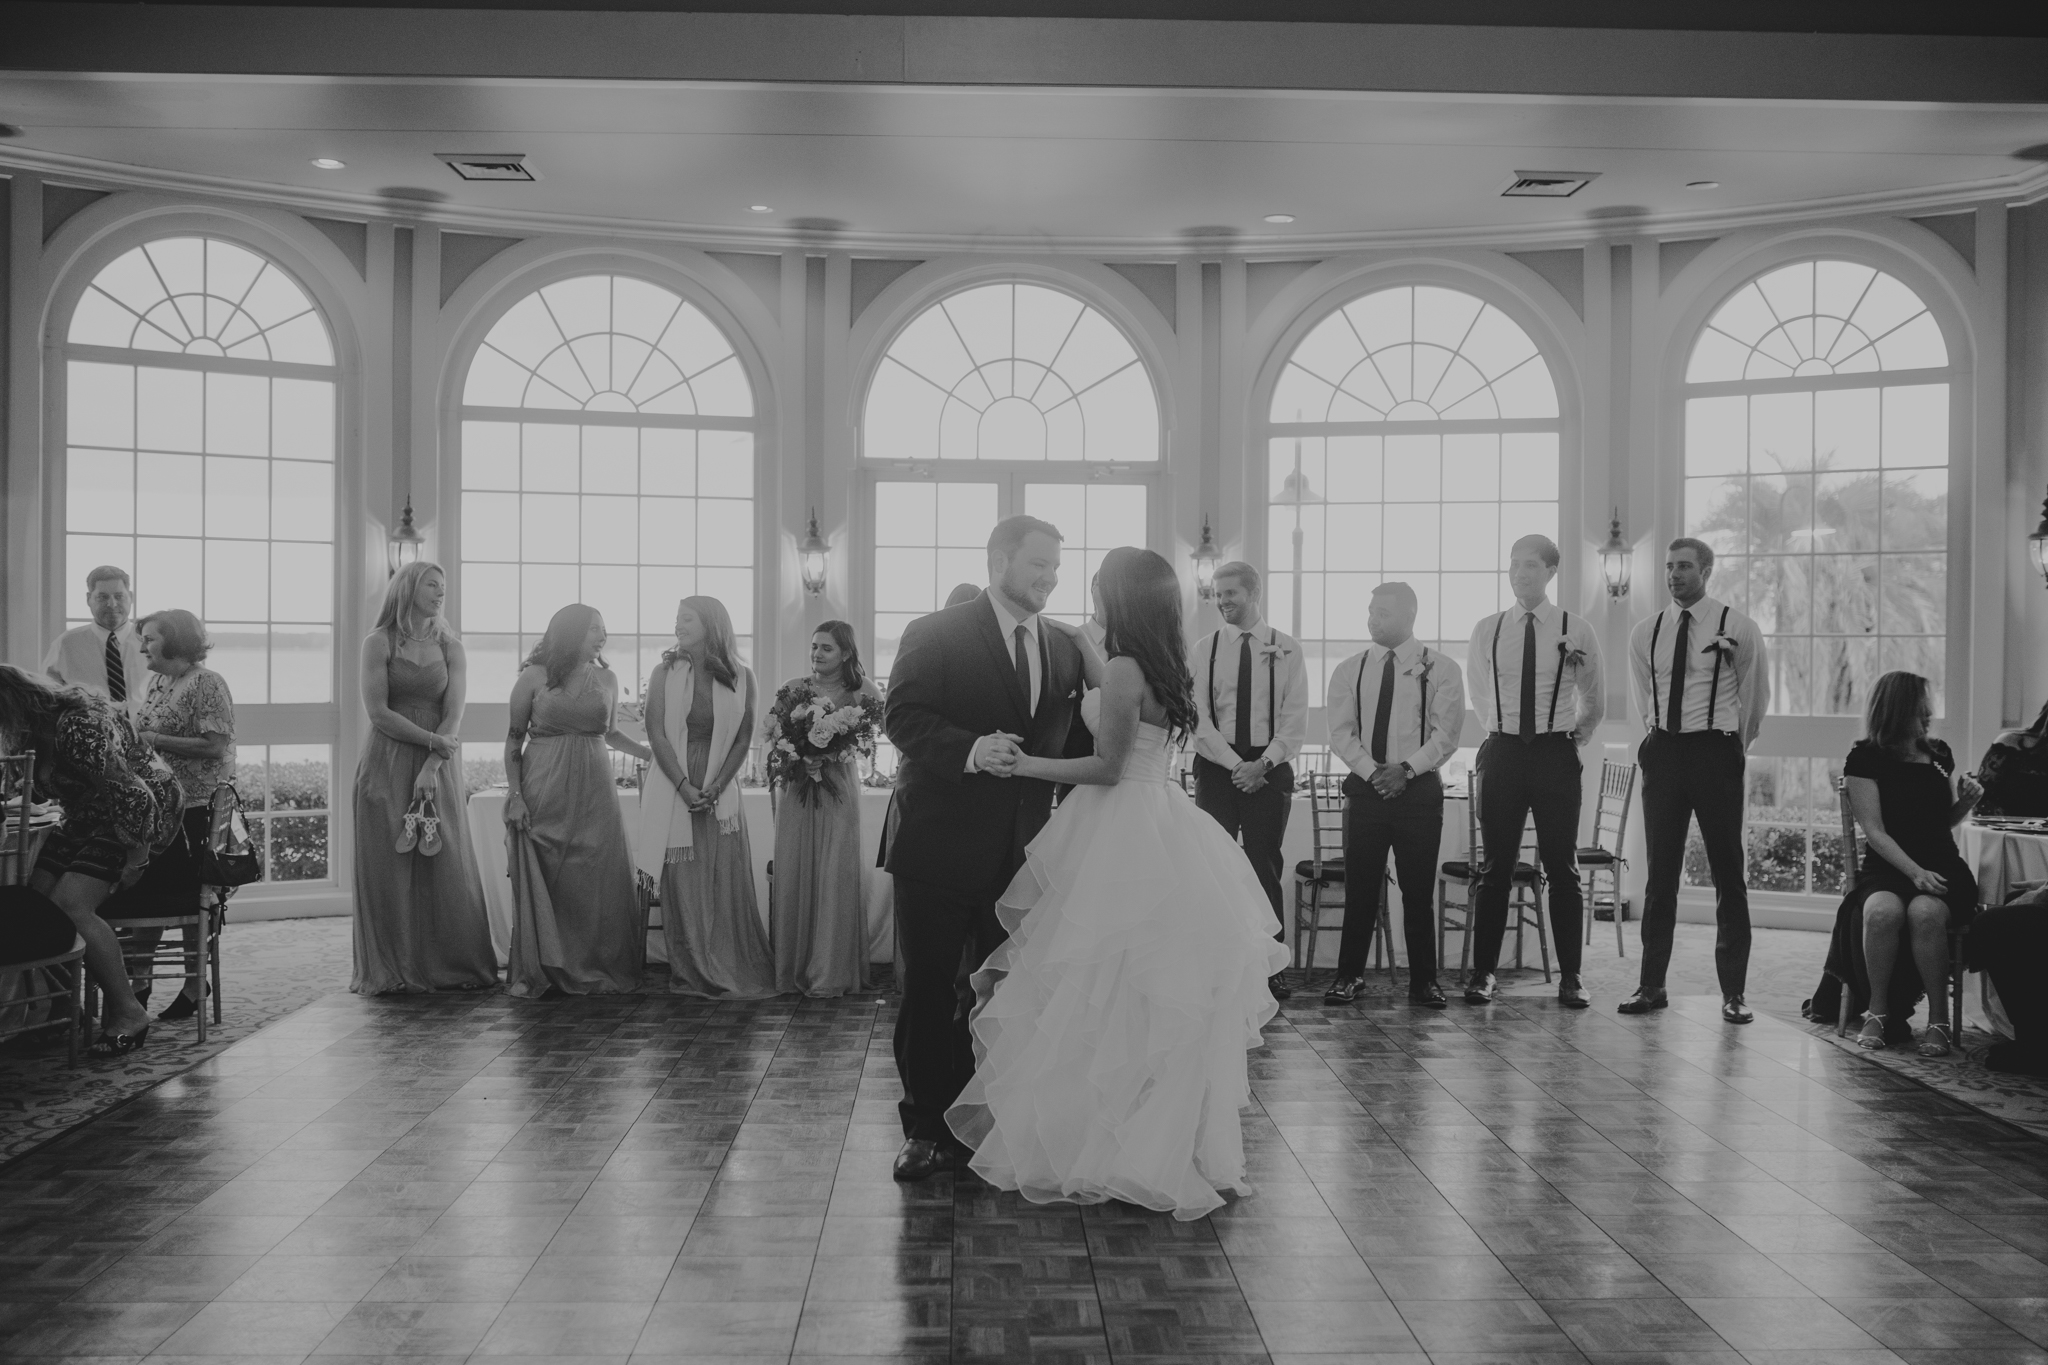 Leah Nicole Photography - Houston Wedding Photographer-Lake Conroe Wedding- Houston Wedding Photographer-43.jpg